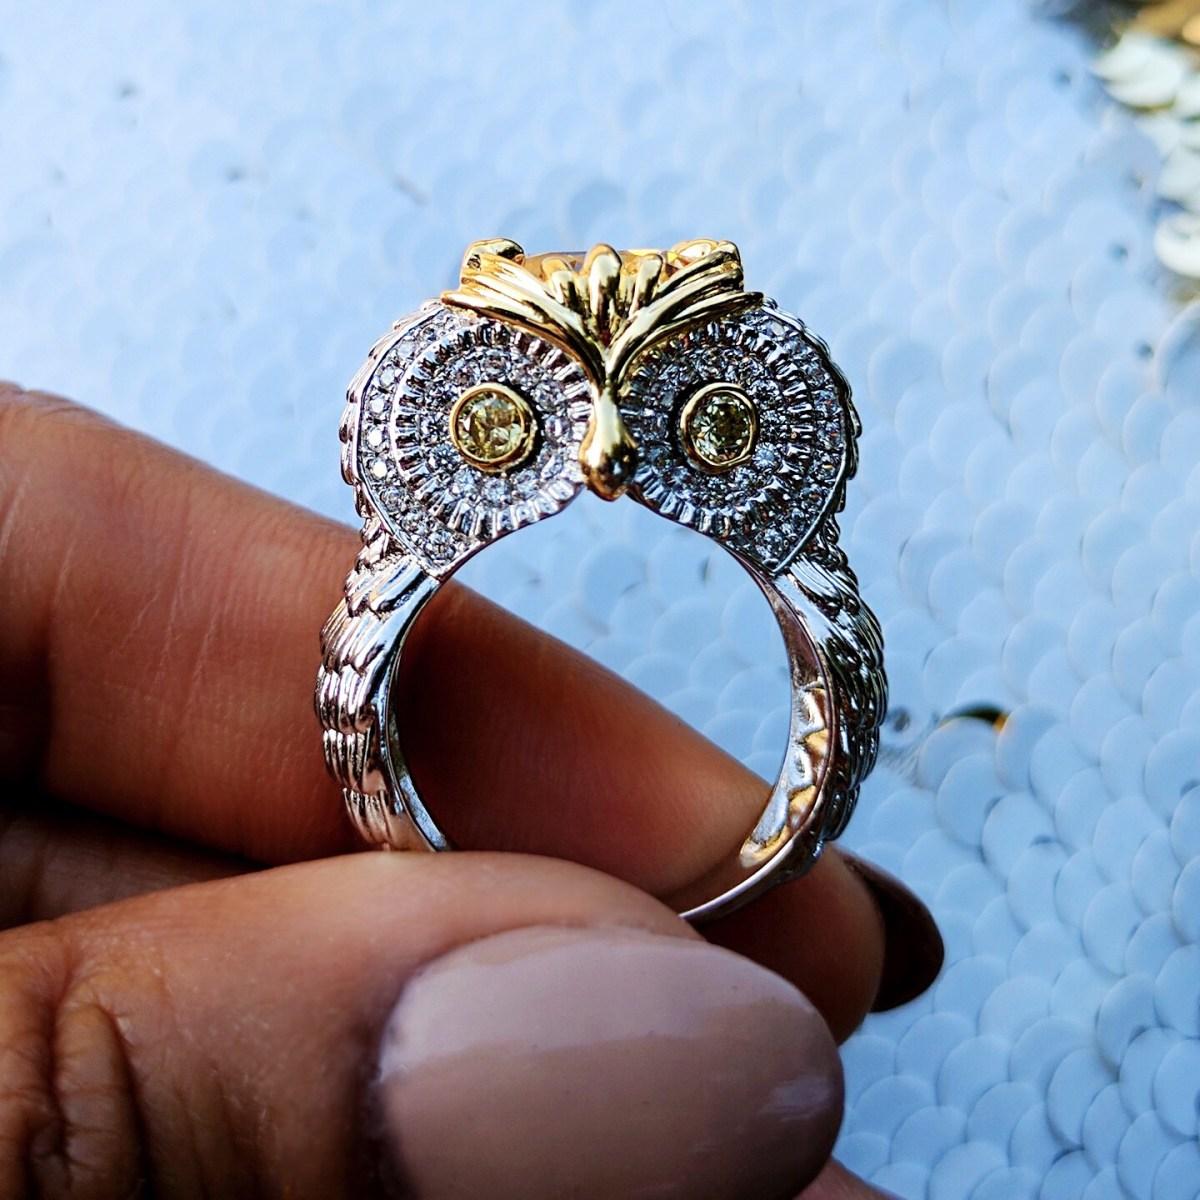 Jeulia-Two-Tone-Feather-Round-Cut-Created-Topaz-Owl-Ring